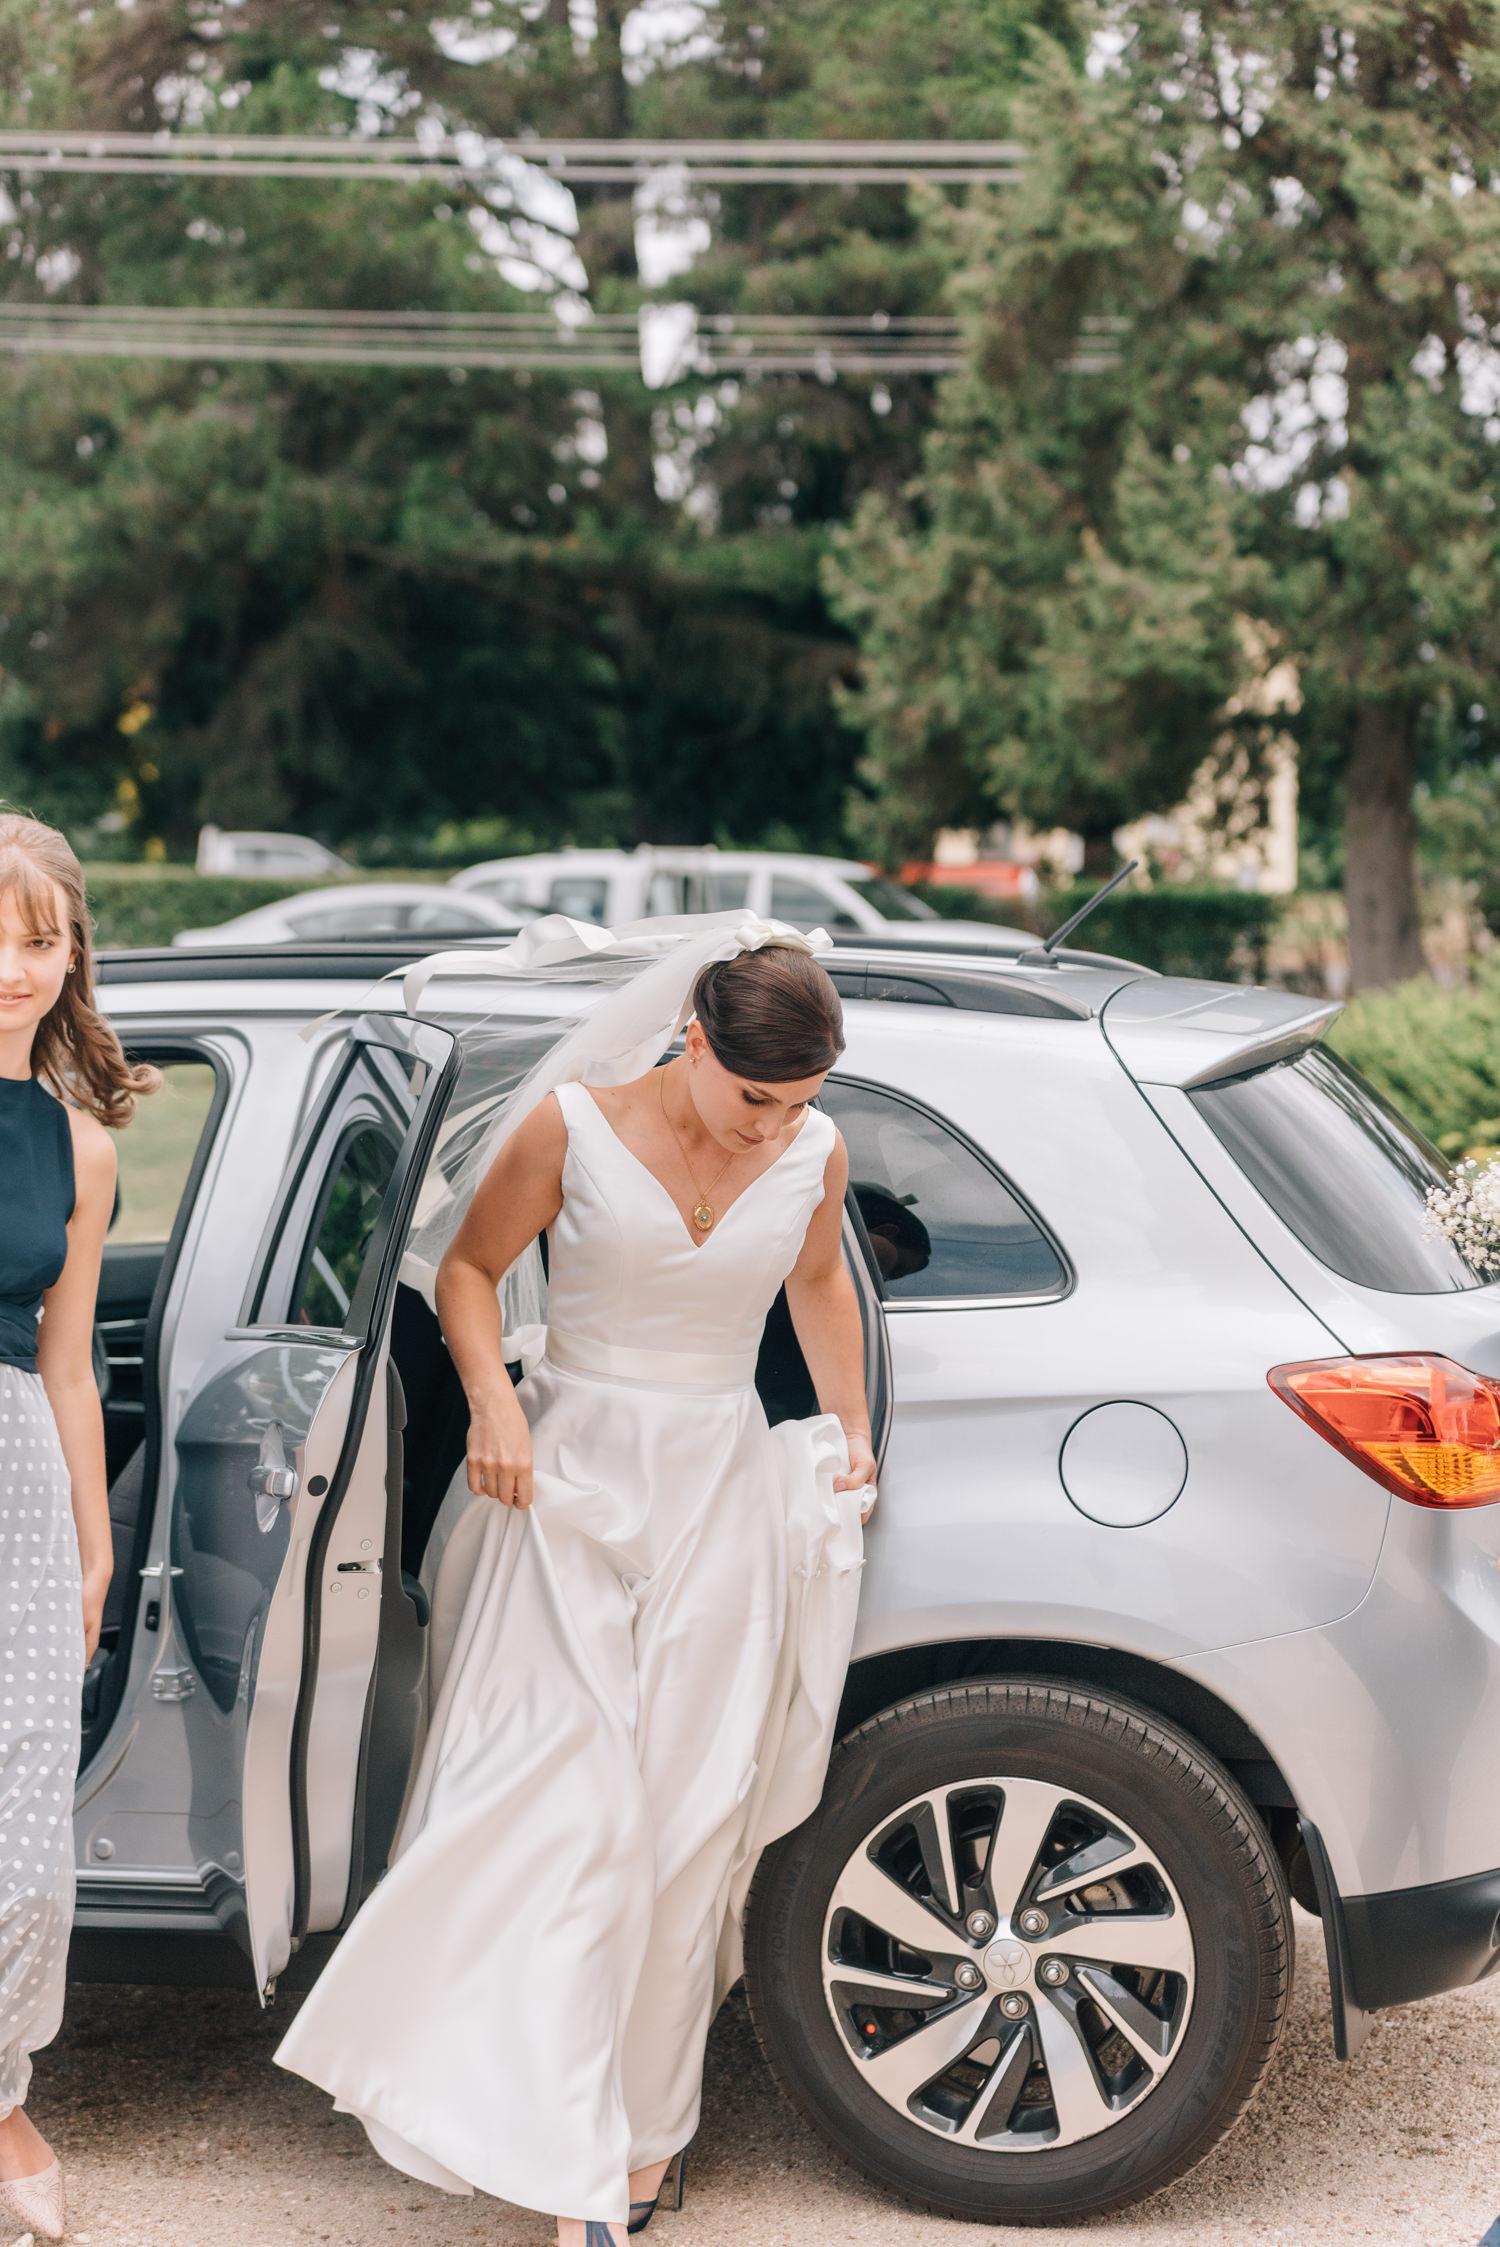 Josef-Chromy-Wedding-Photographer-11.jpg